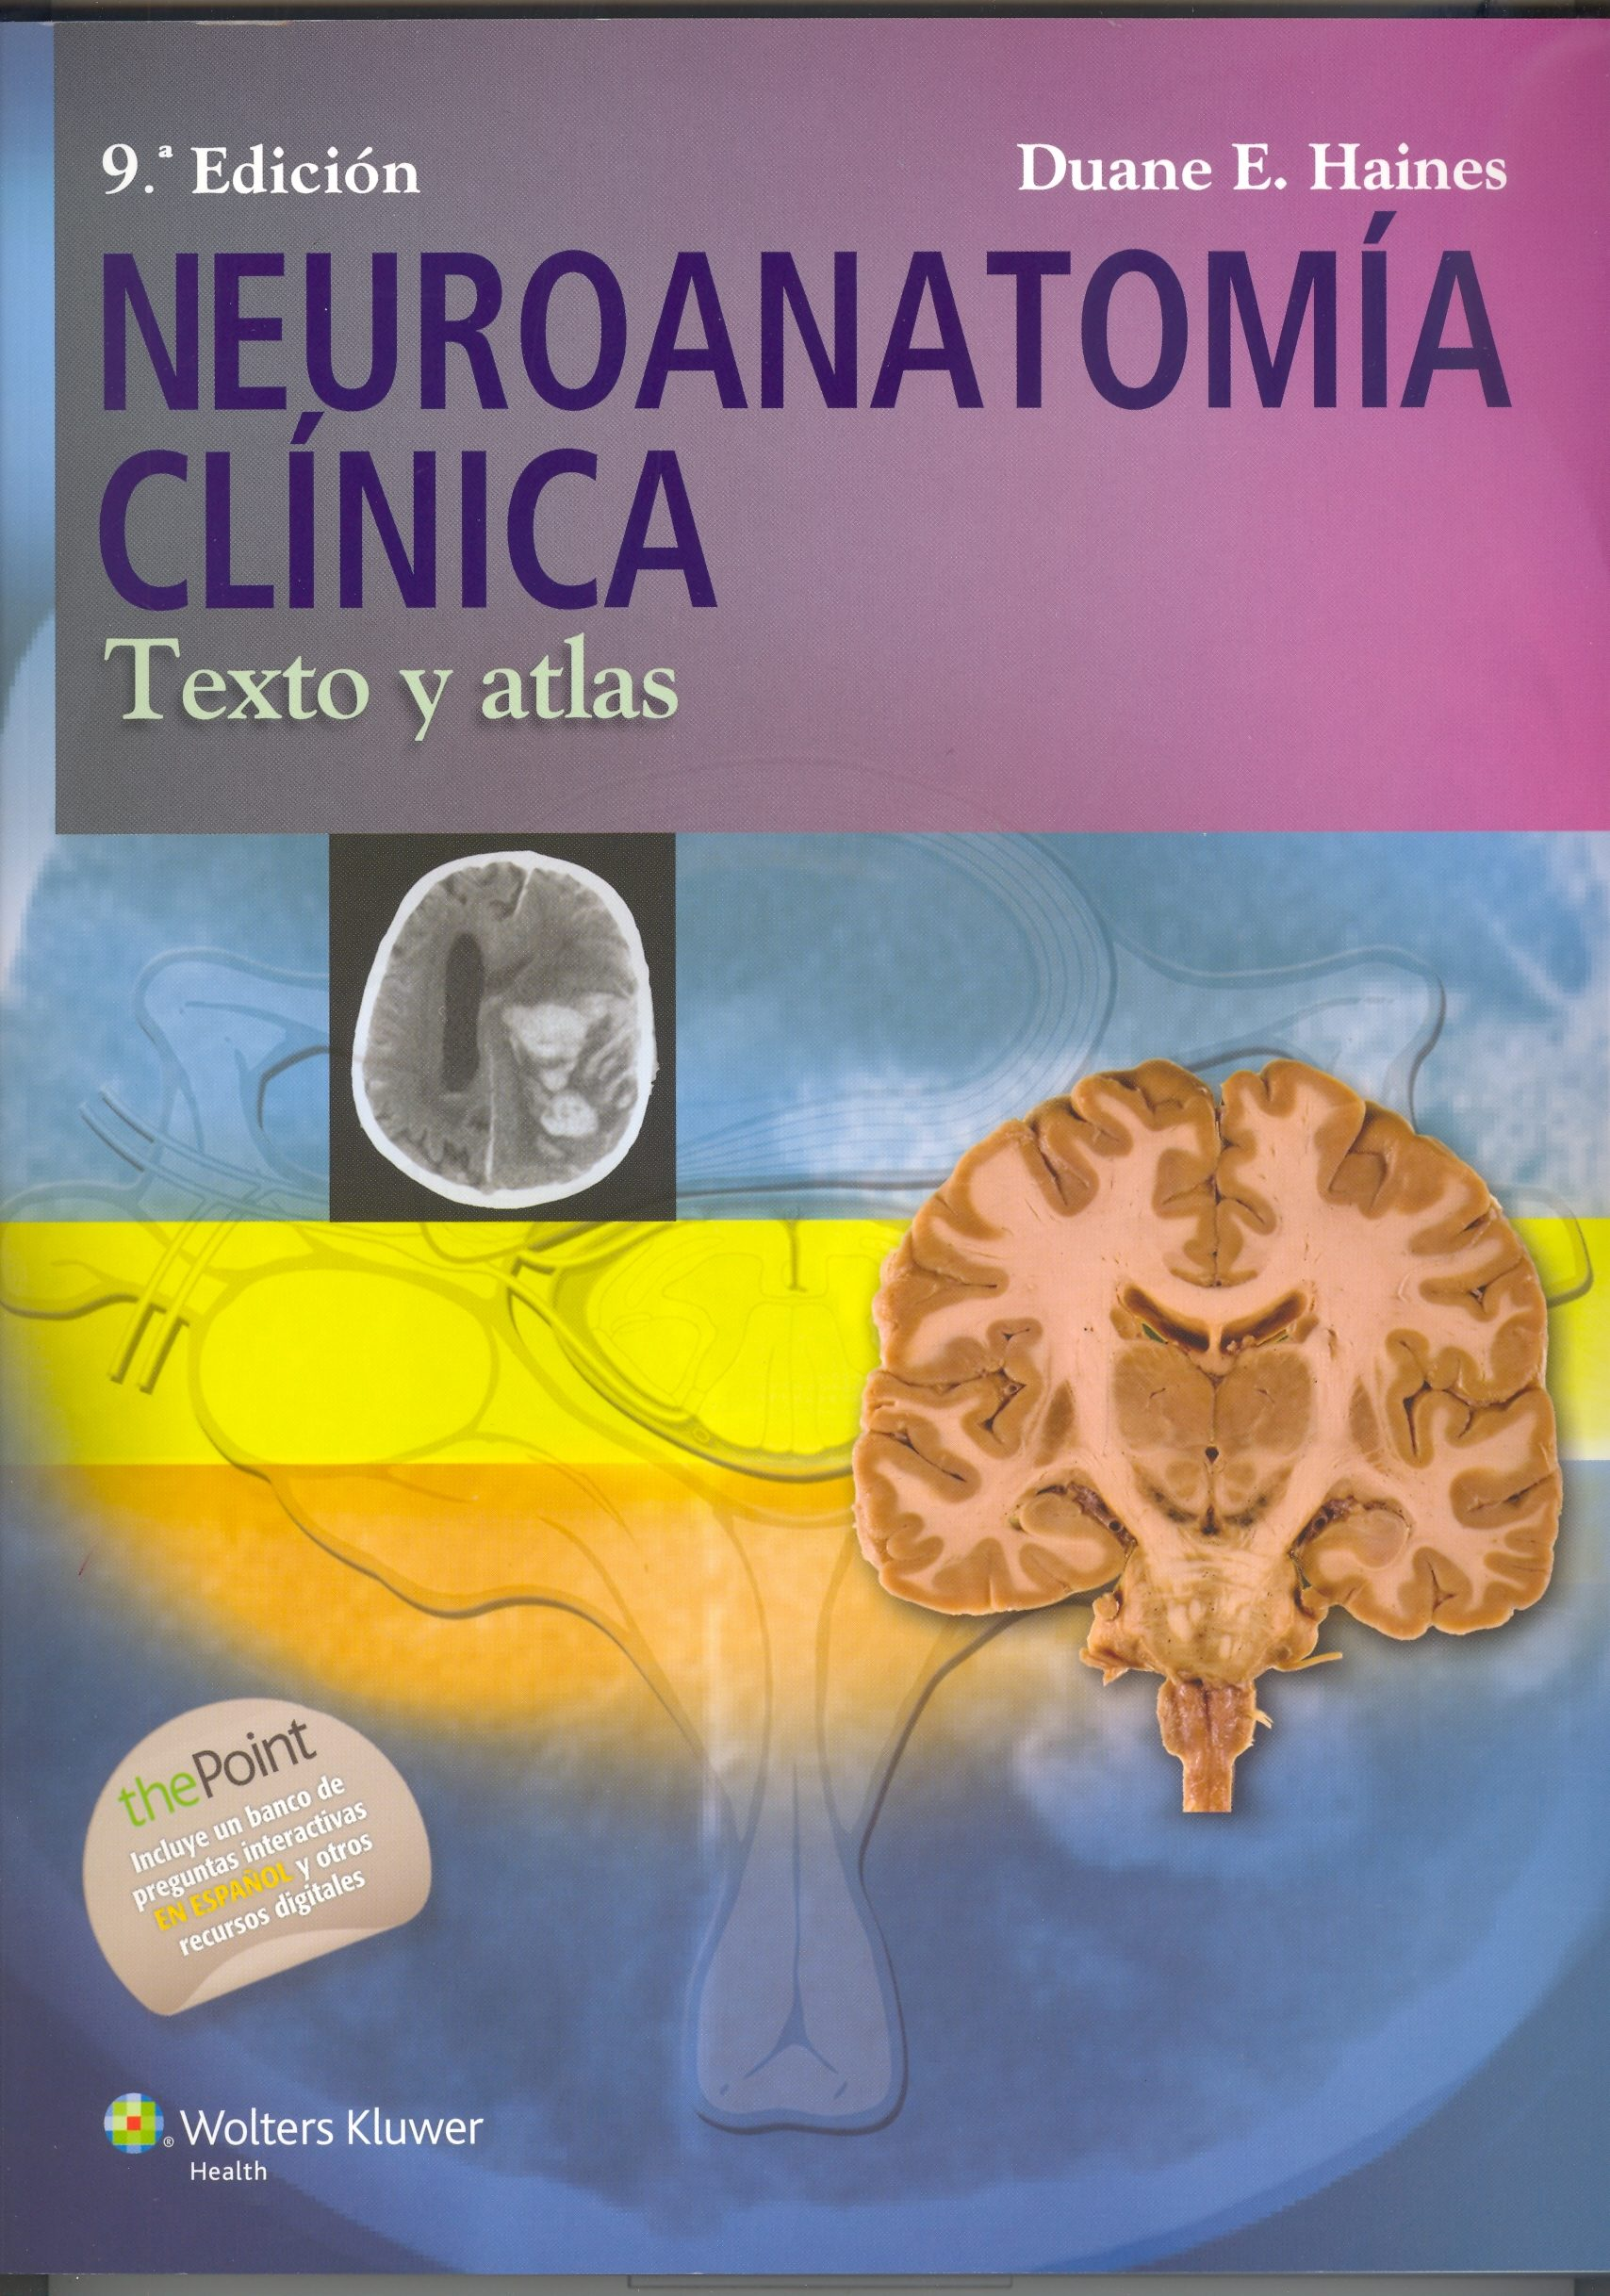 Neuroanatomia Clinica: Texto Y Atlas (9ª Ed.) por Duane E. Haines